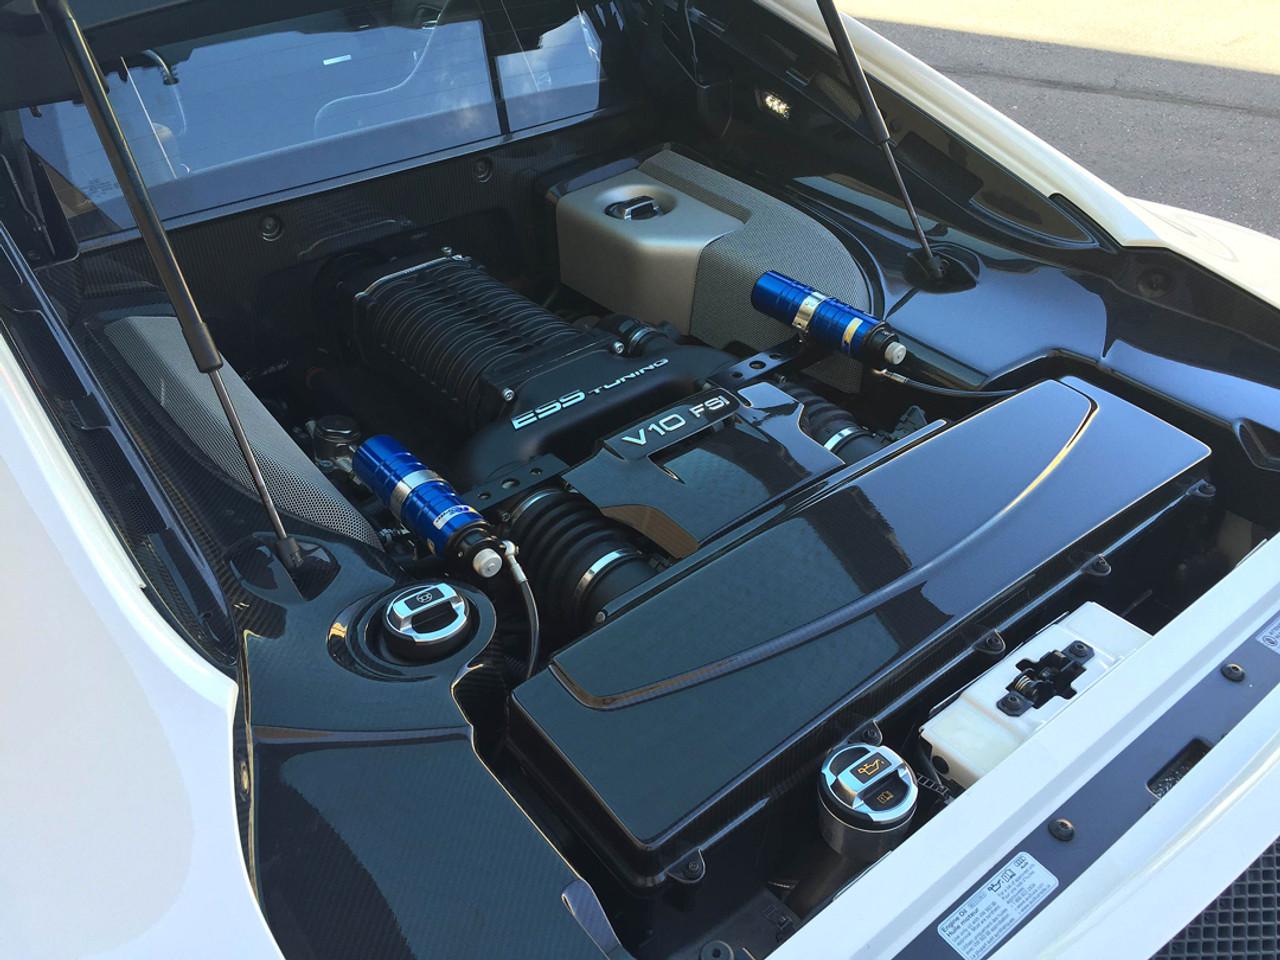 R8 V10 TS-760 supercharger system